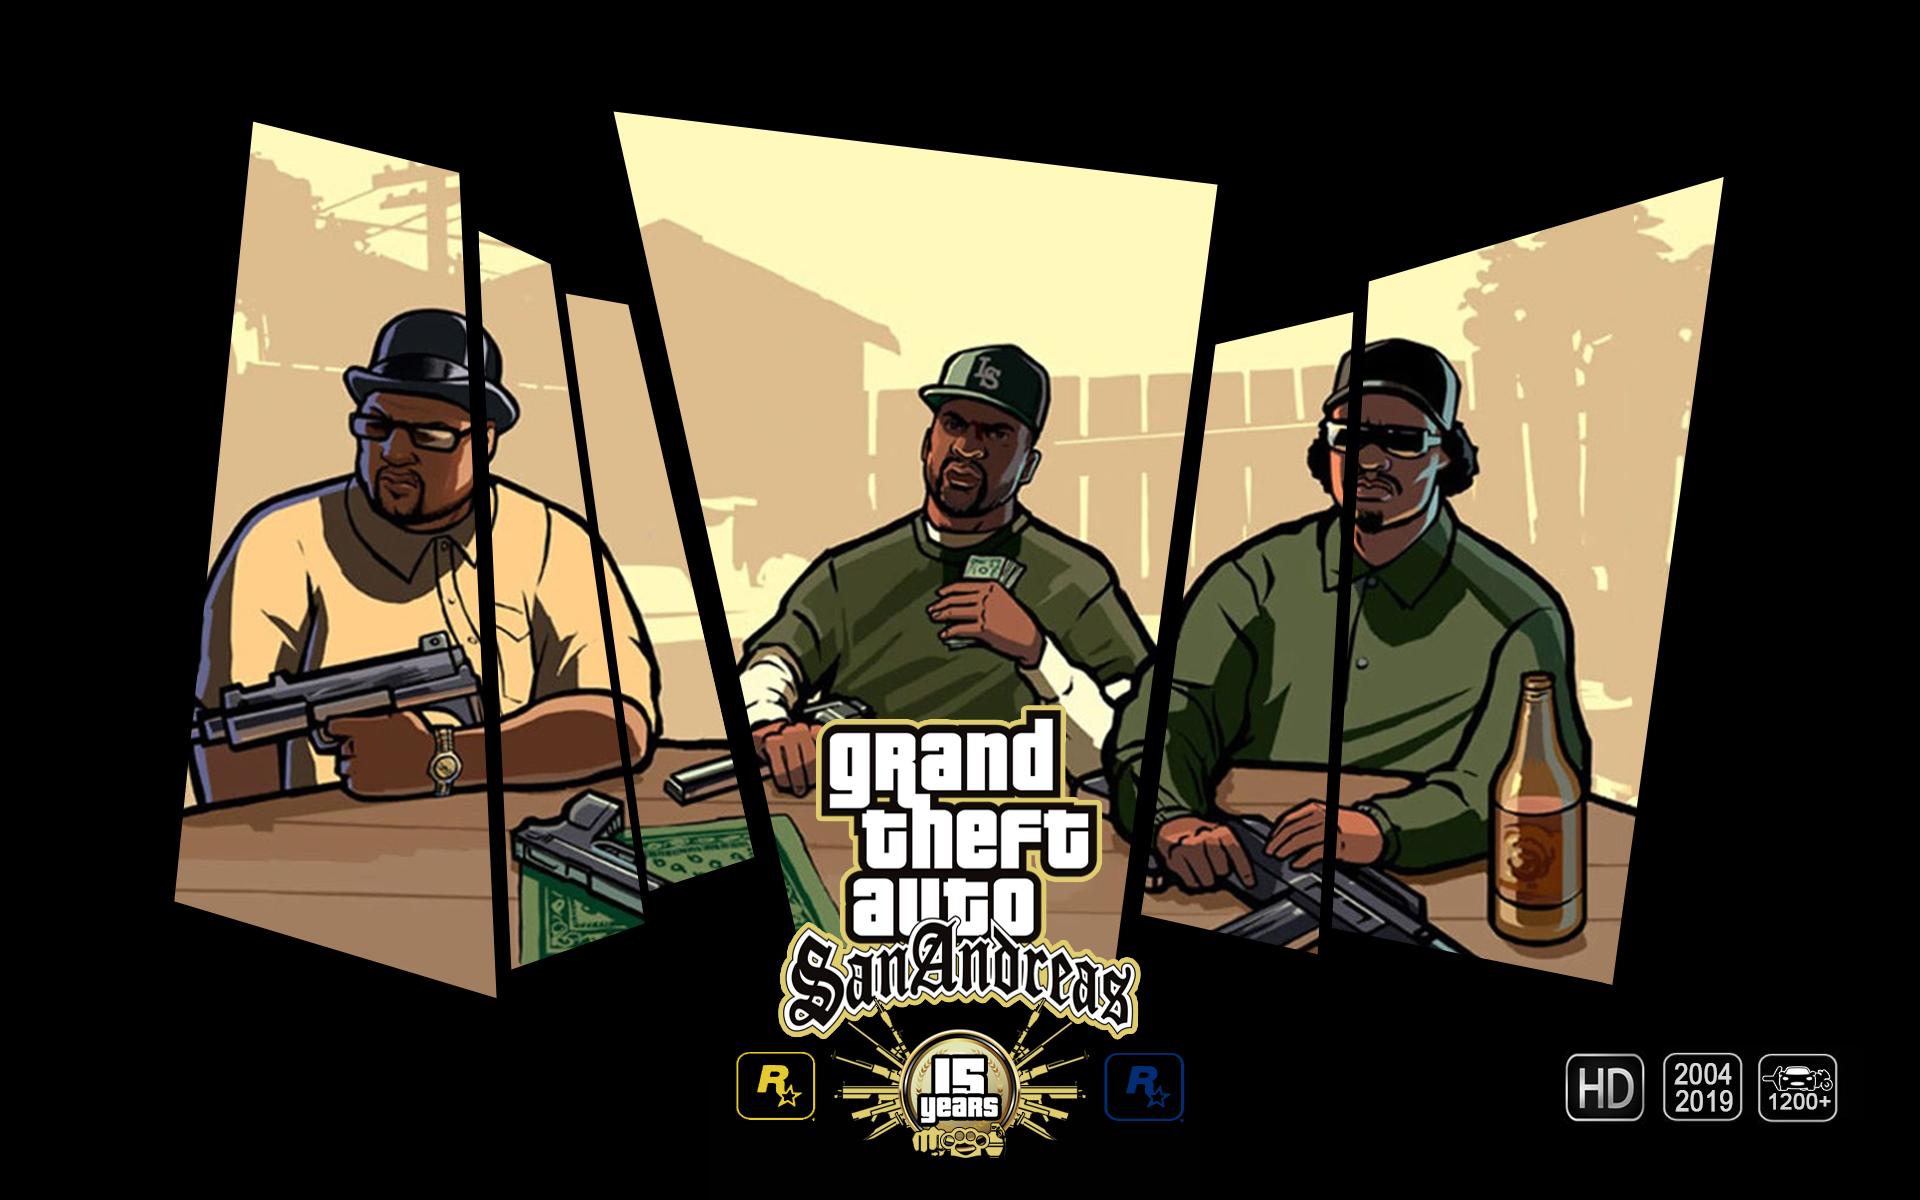 Wallpaper Gta Anniversary Gta San Andreas Grand Theft Auto